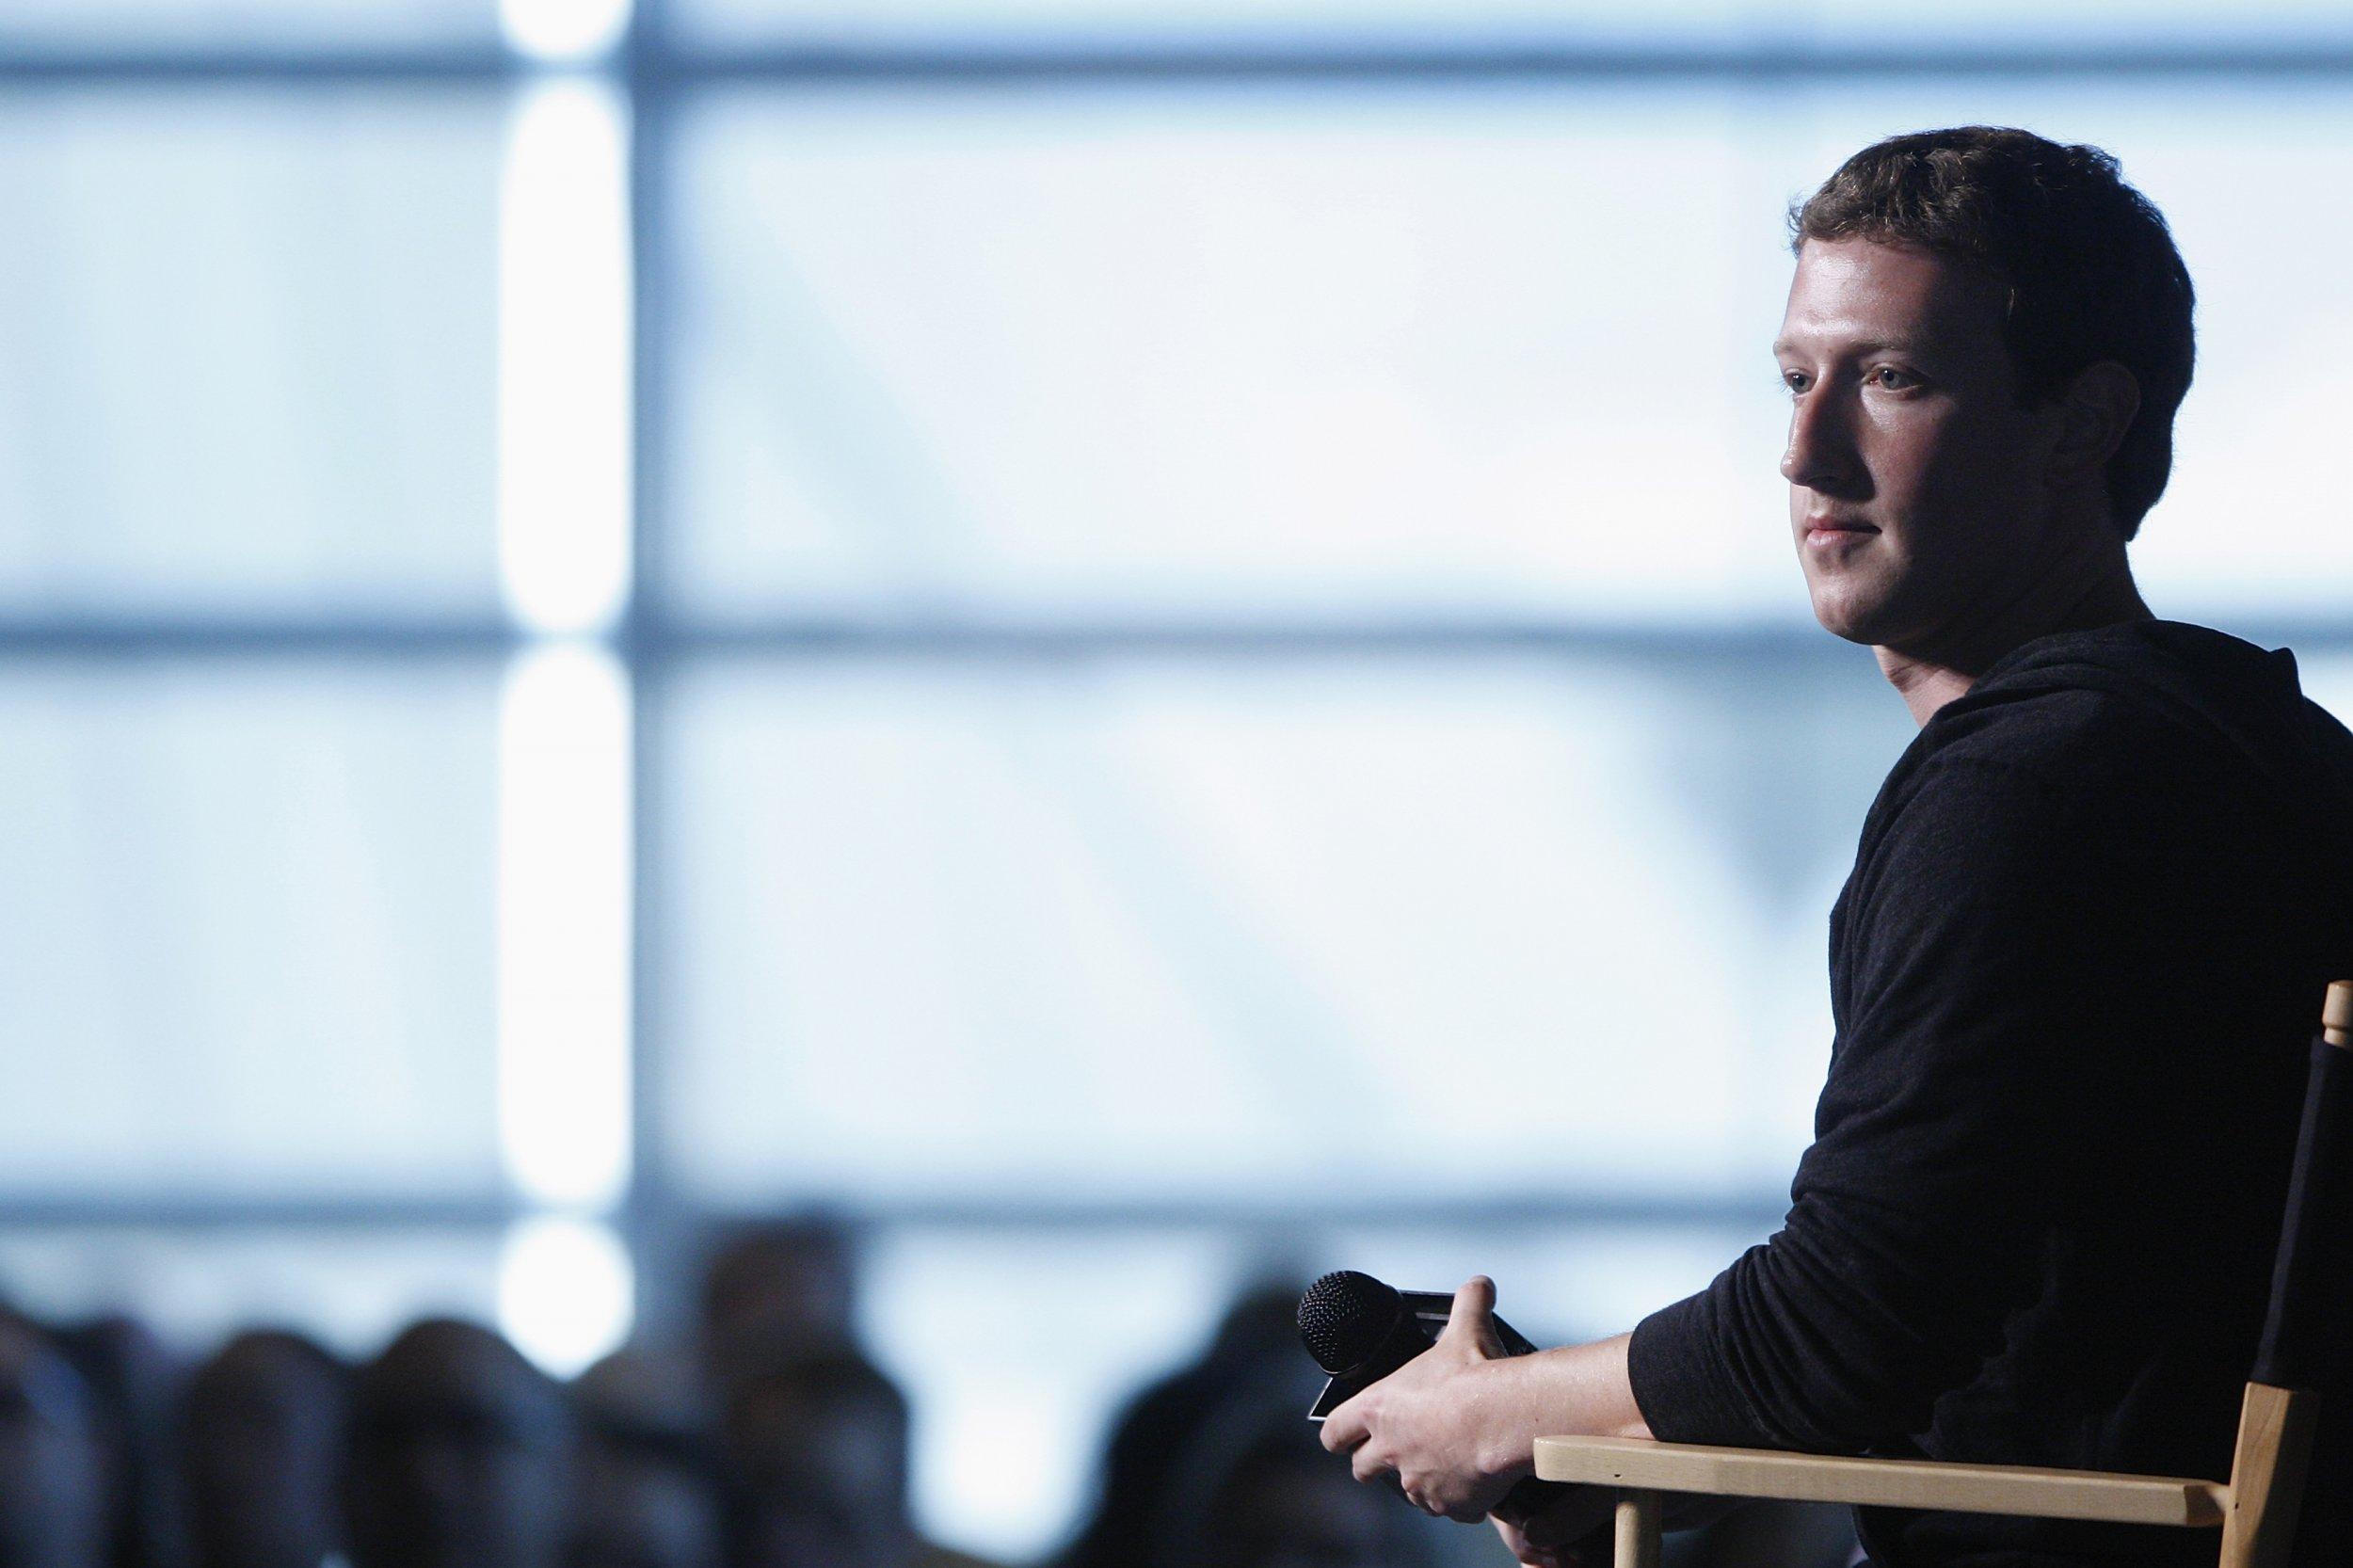 1-5-15 Zuckerberg